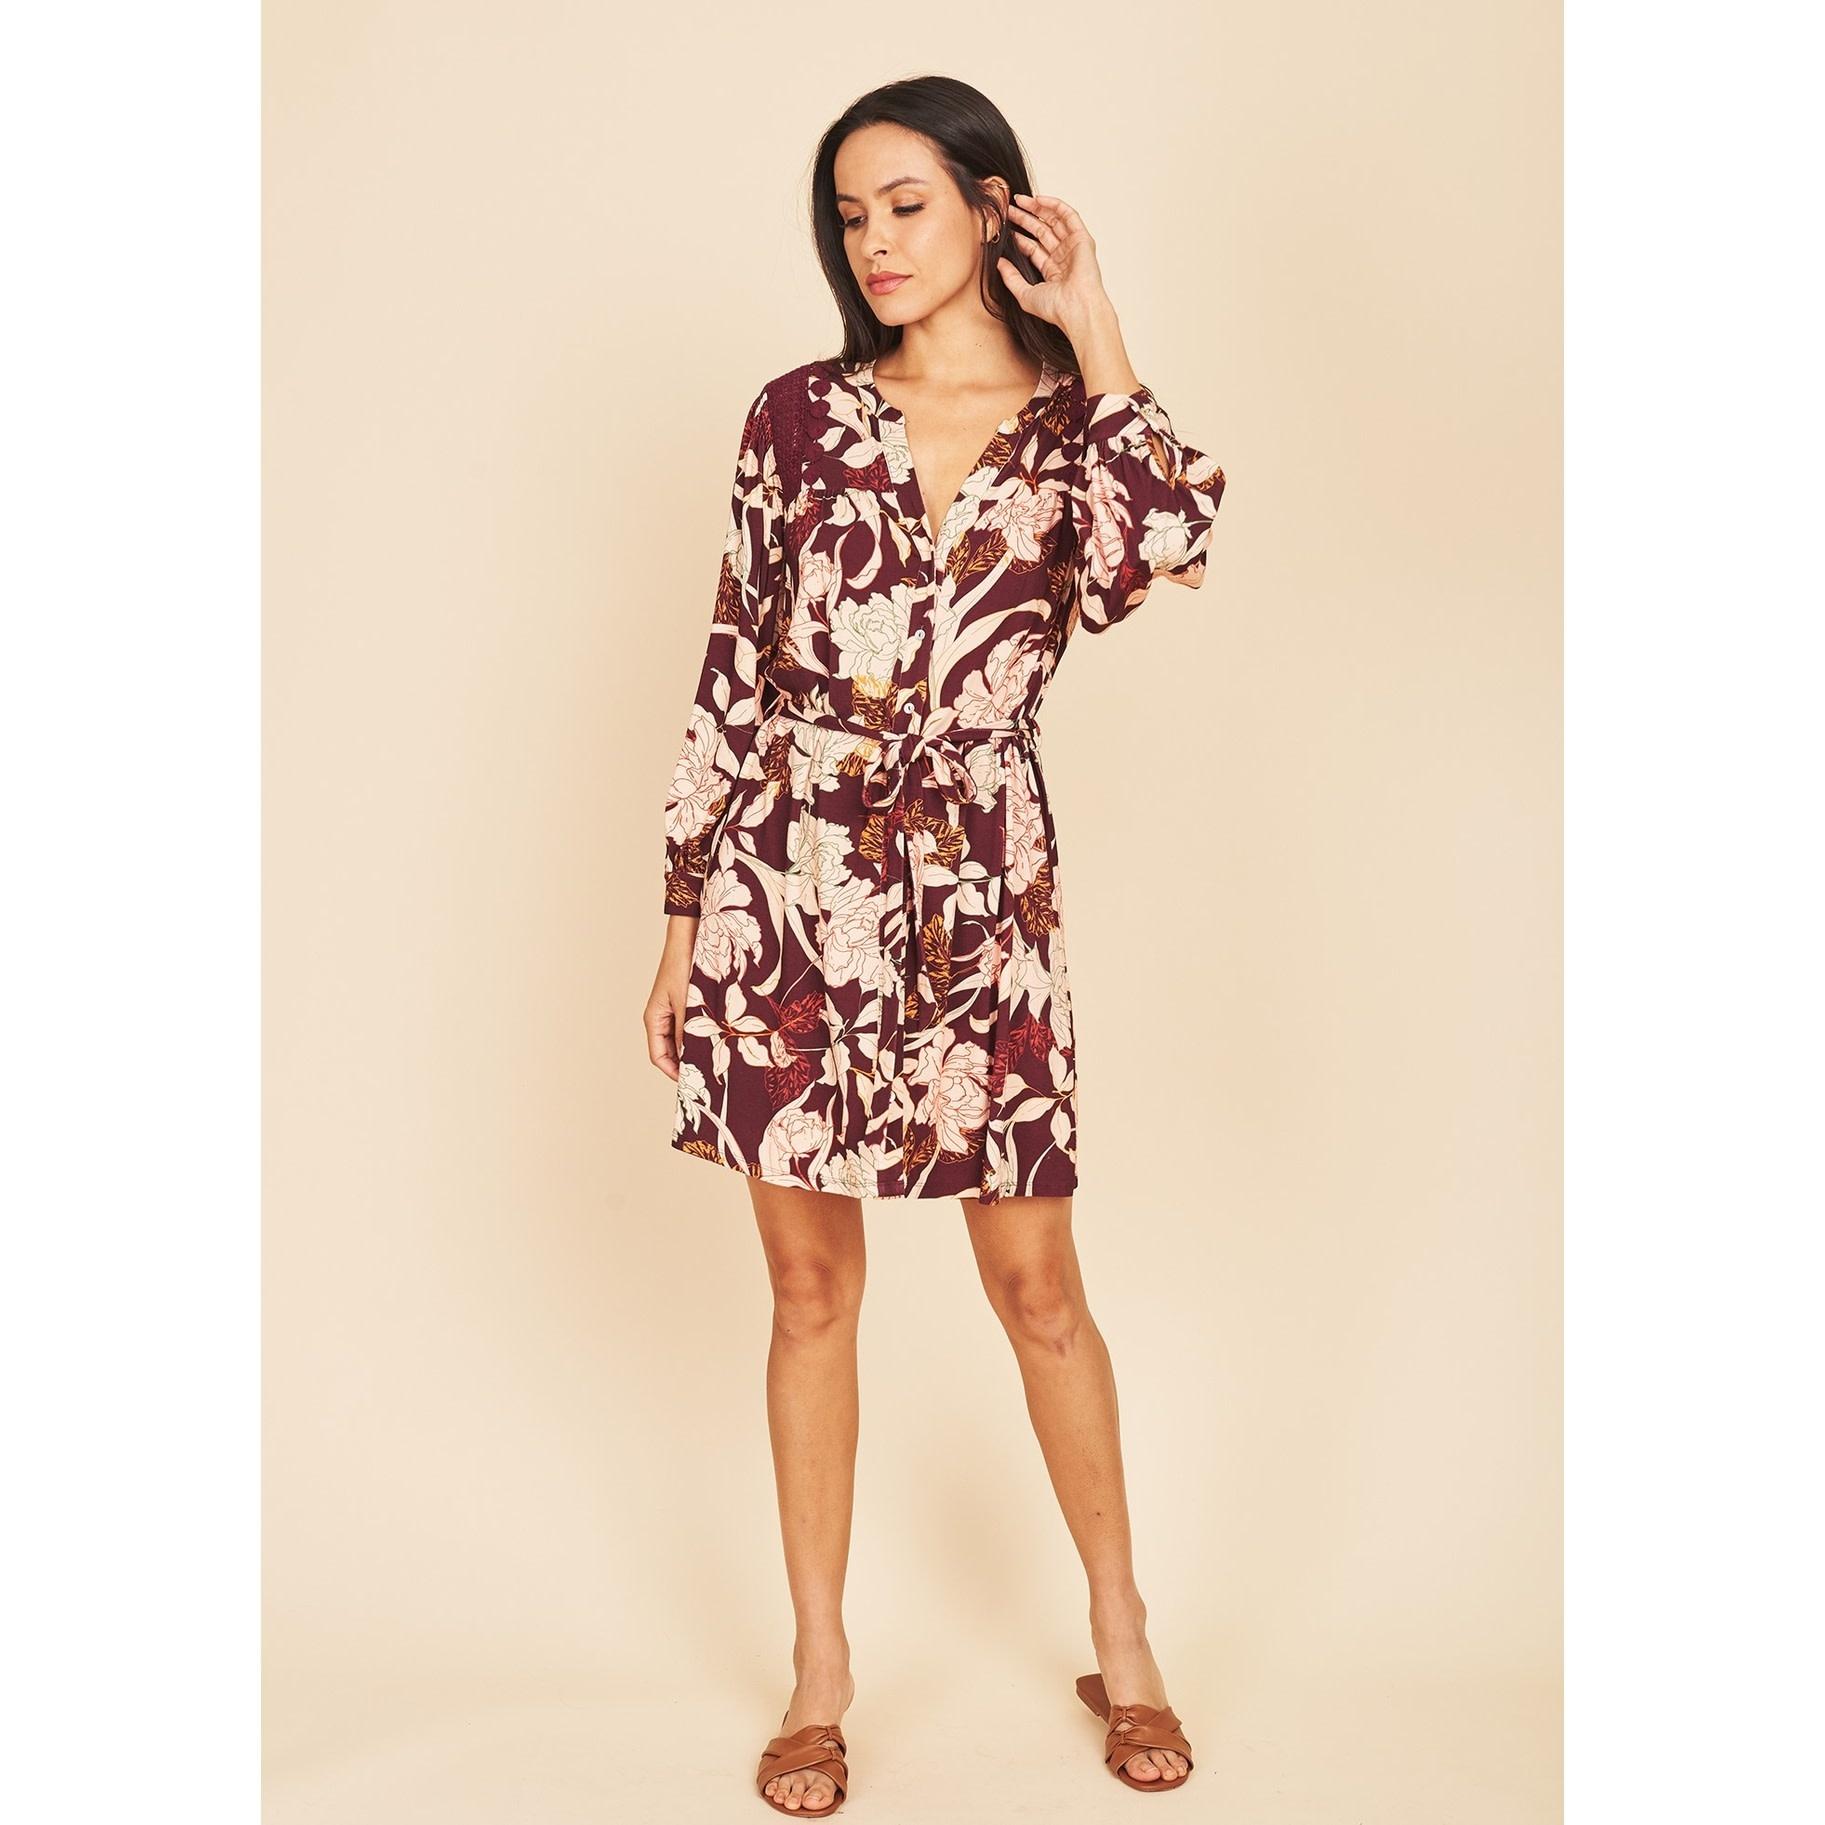 Christine Button Down Dress